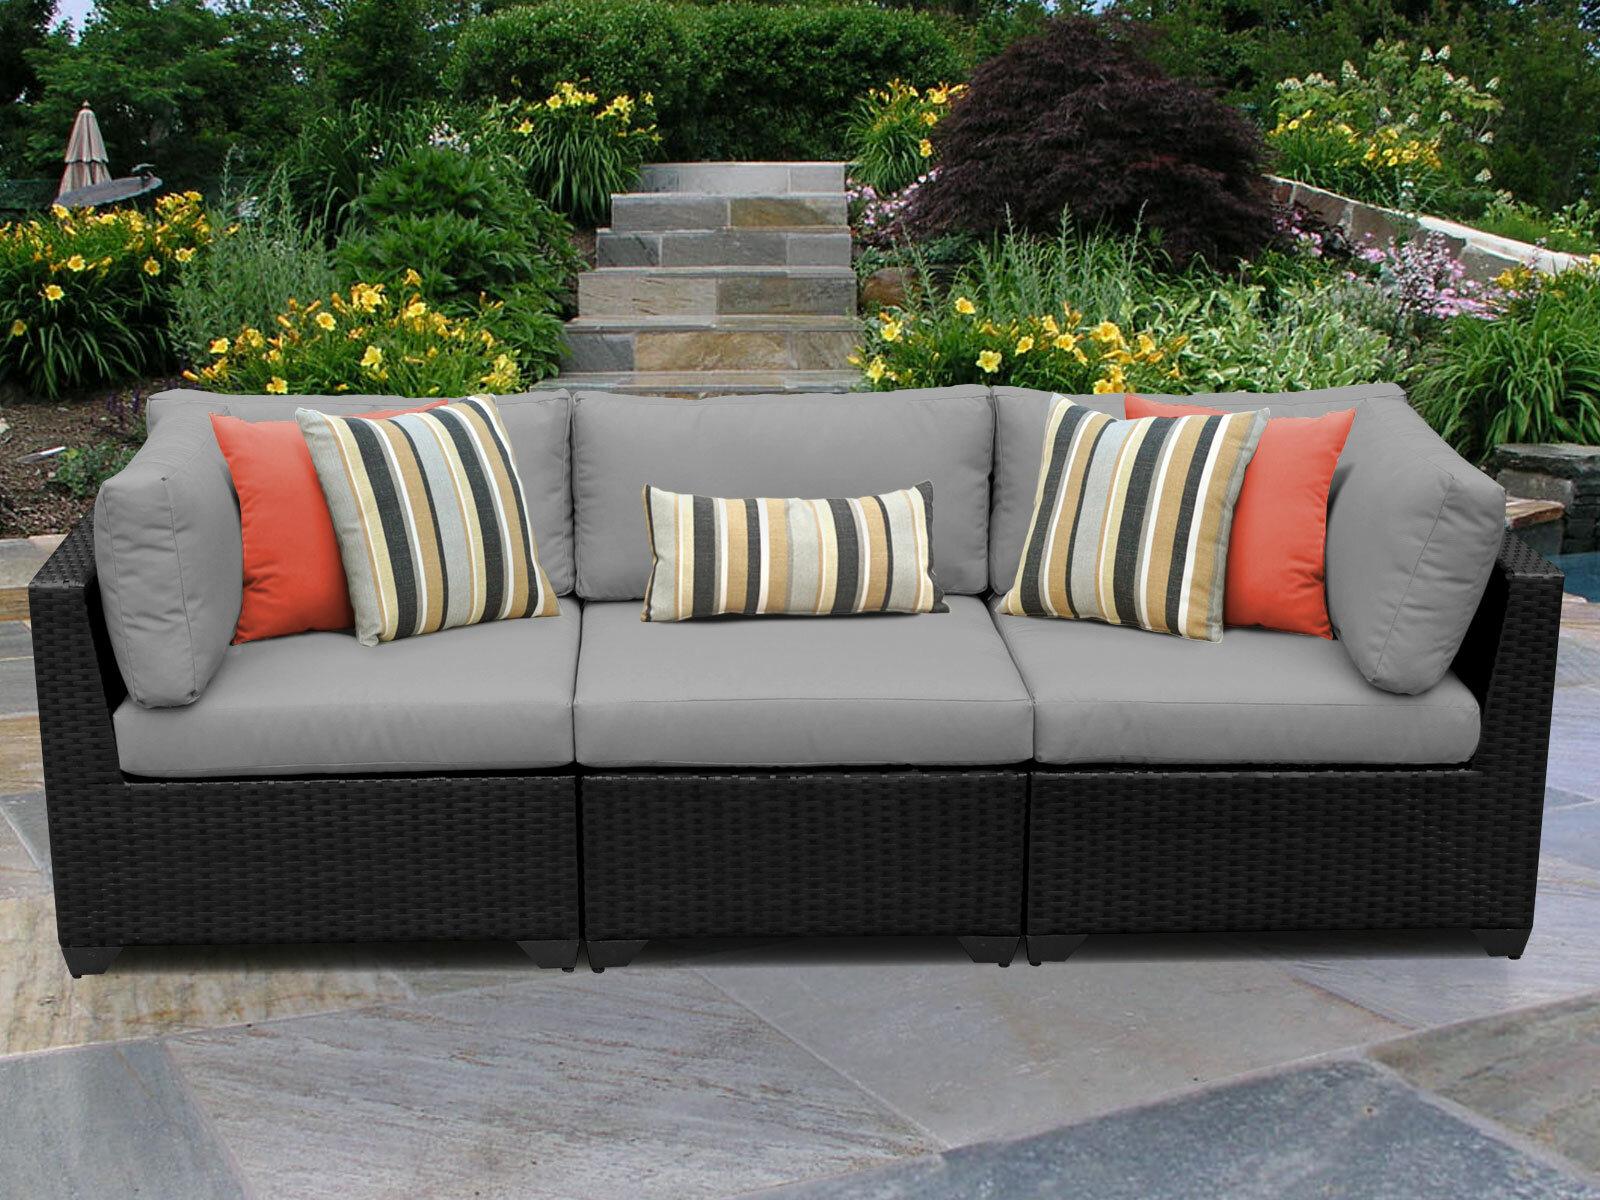 Medley Patio Sofa With Cushions